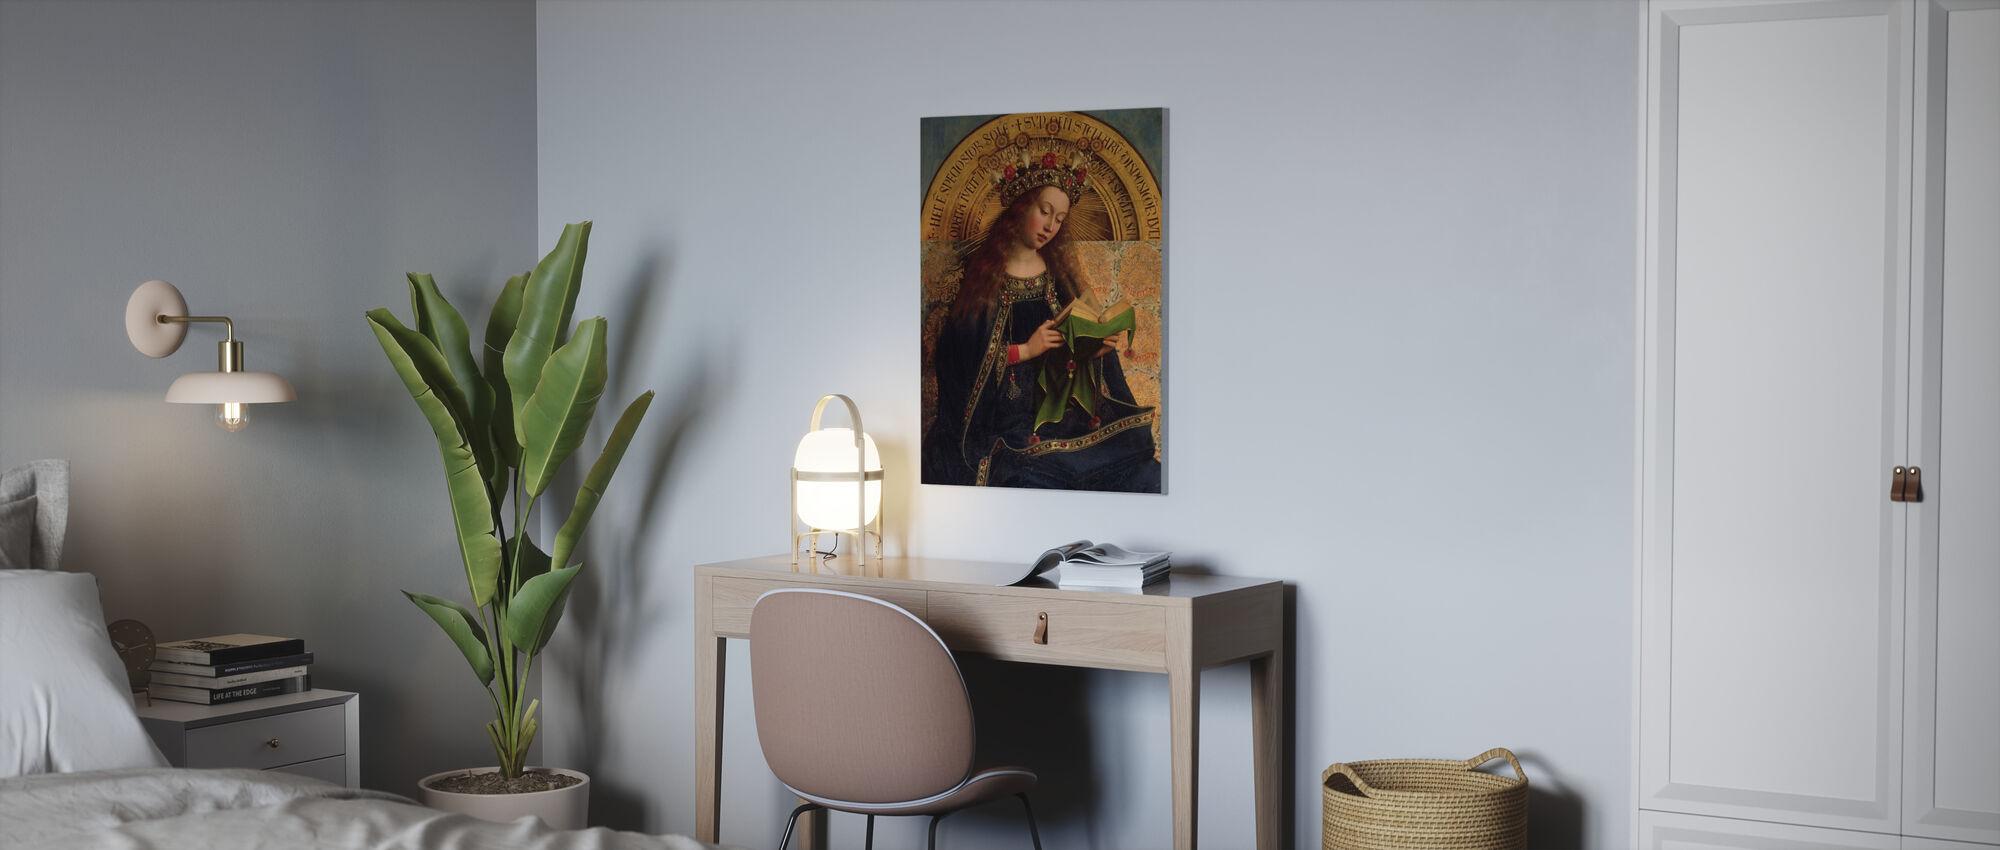 Virgin Mary - Hubert Eyck - Canvas print - Office